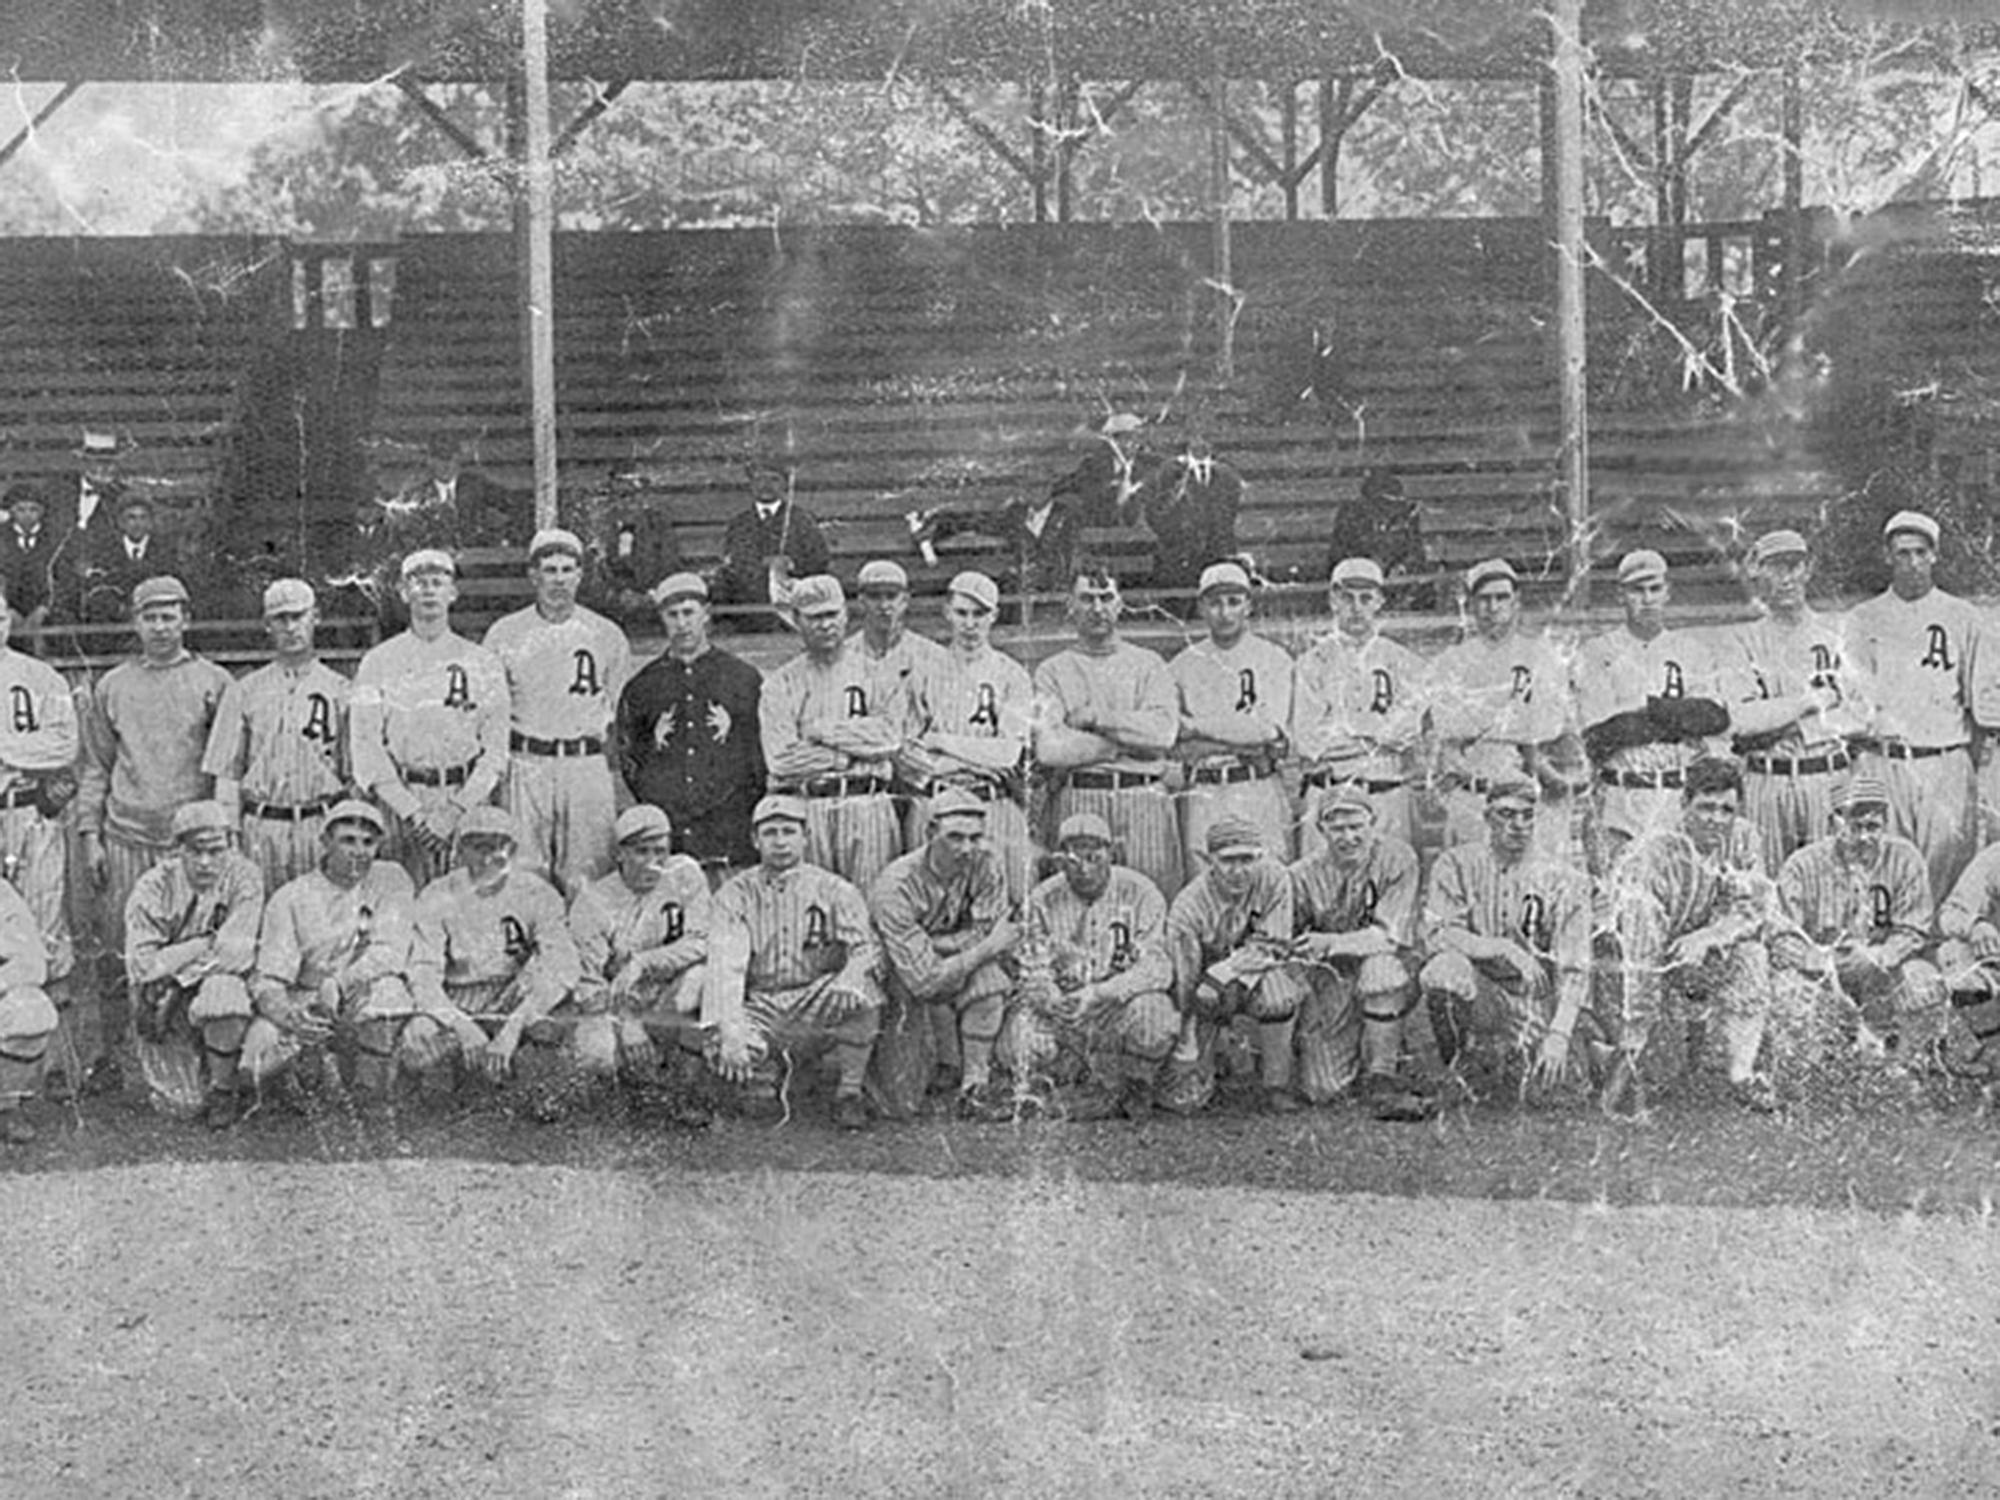 1916 Philadelphia A's